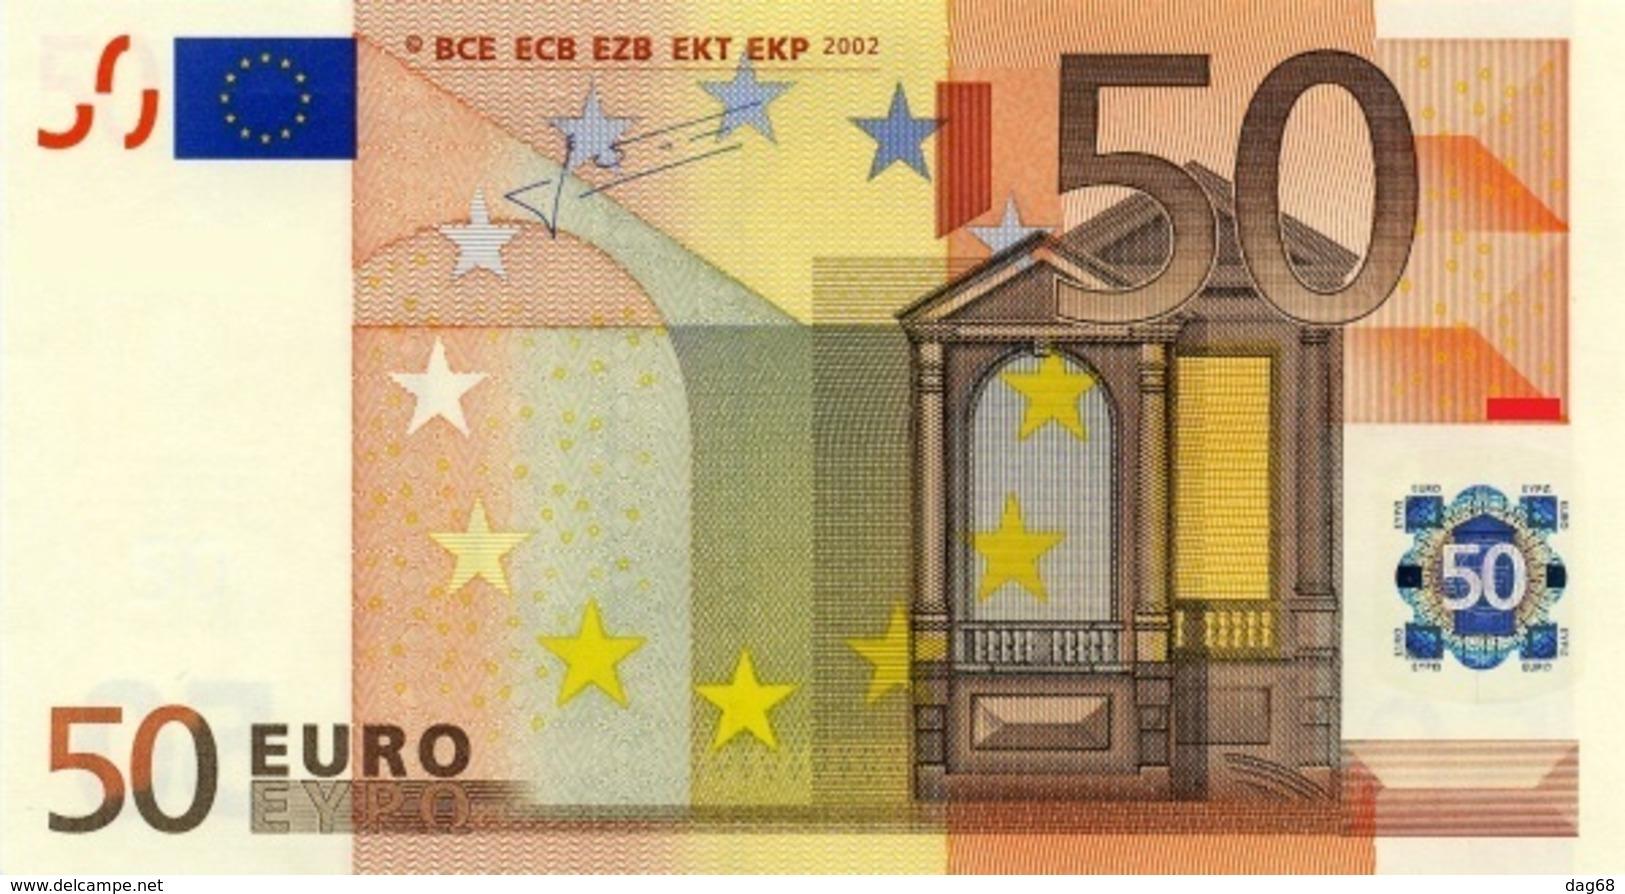 EURO SPAIN 50 V M044 M045 UNC TRICHET JUST ONE CODE - 50 Euro